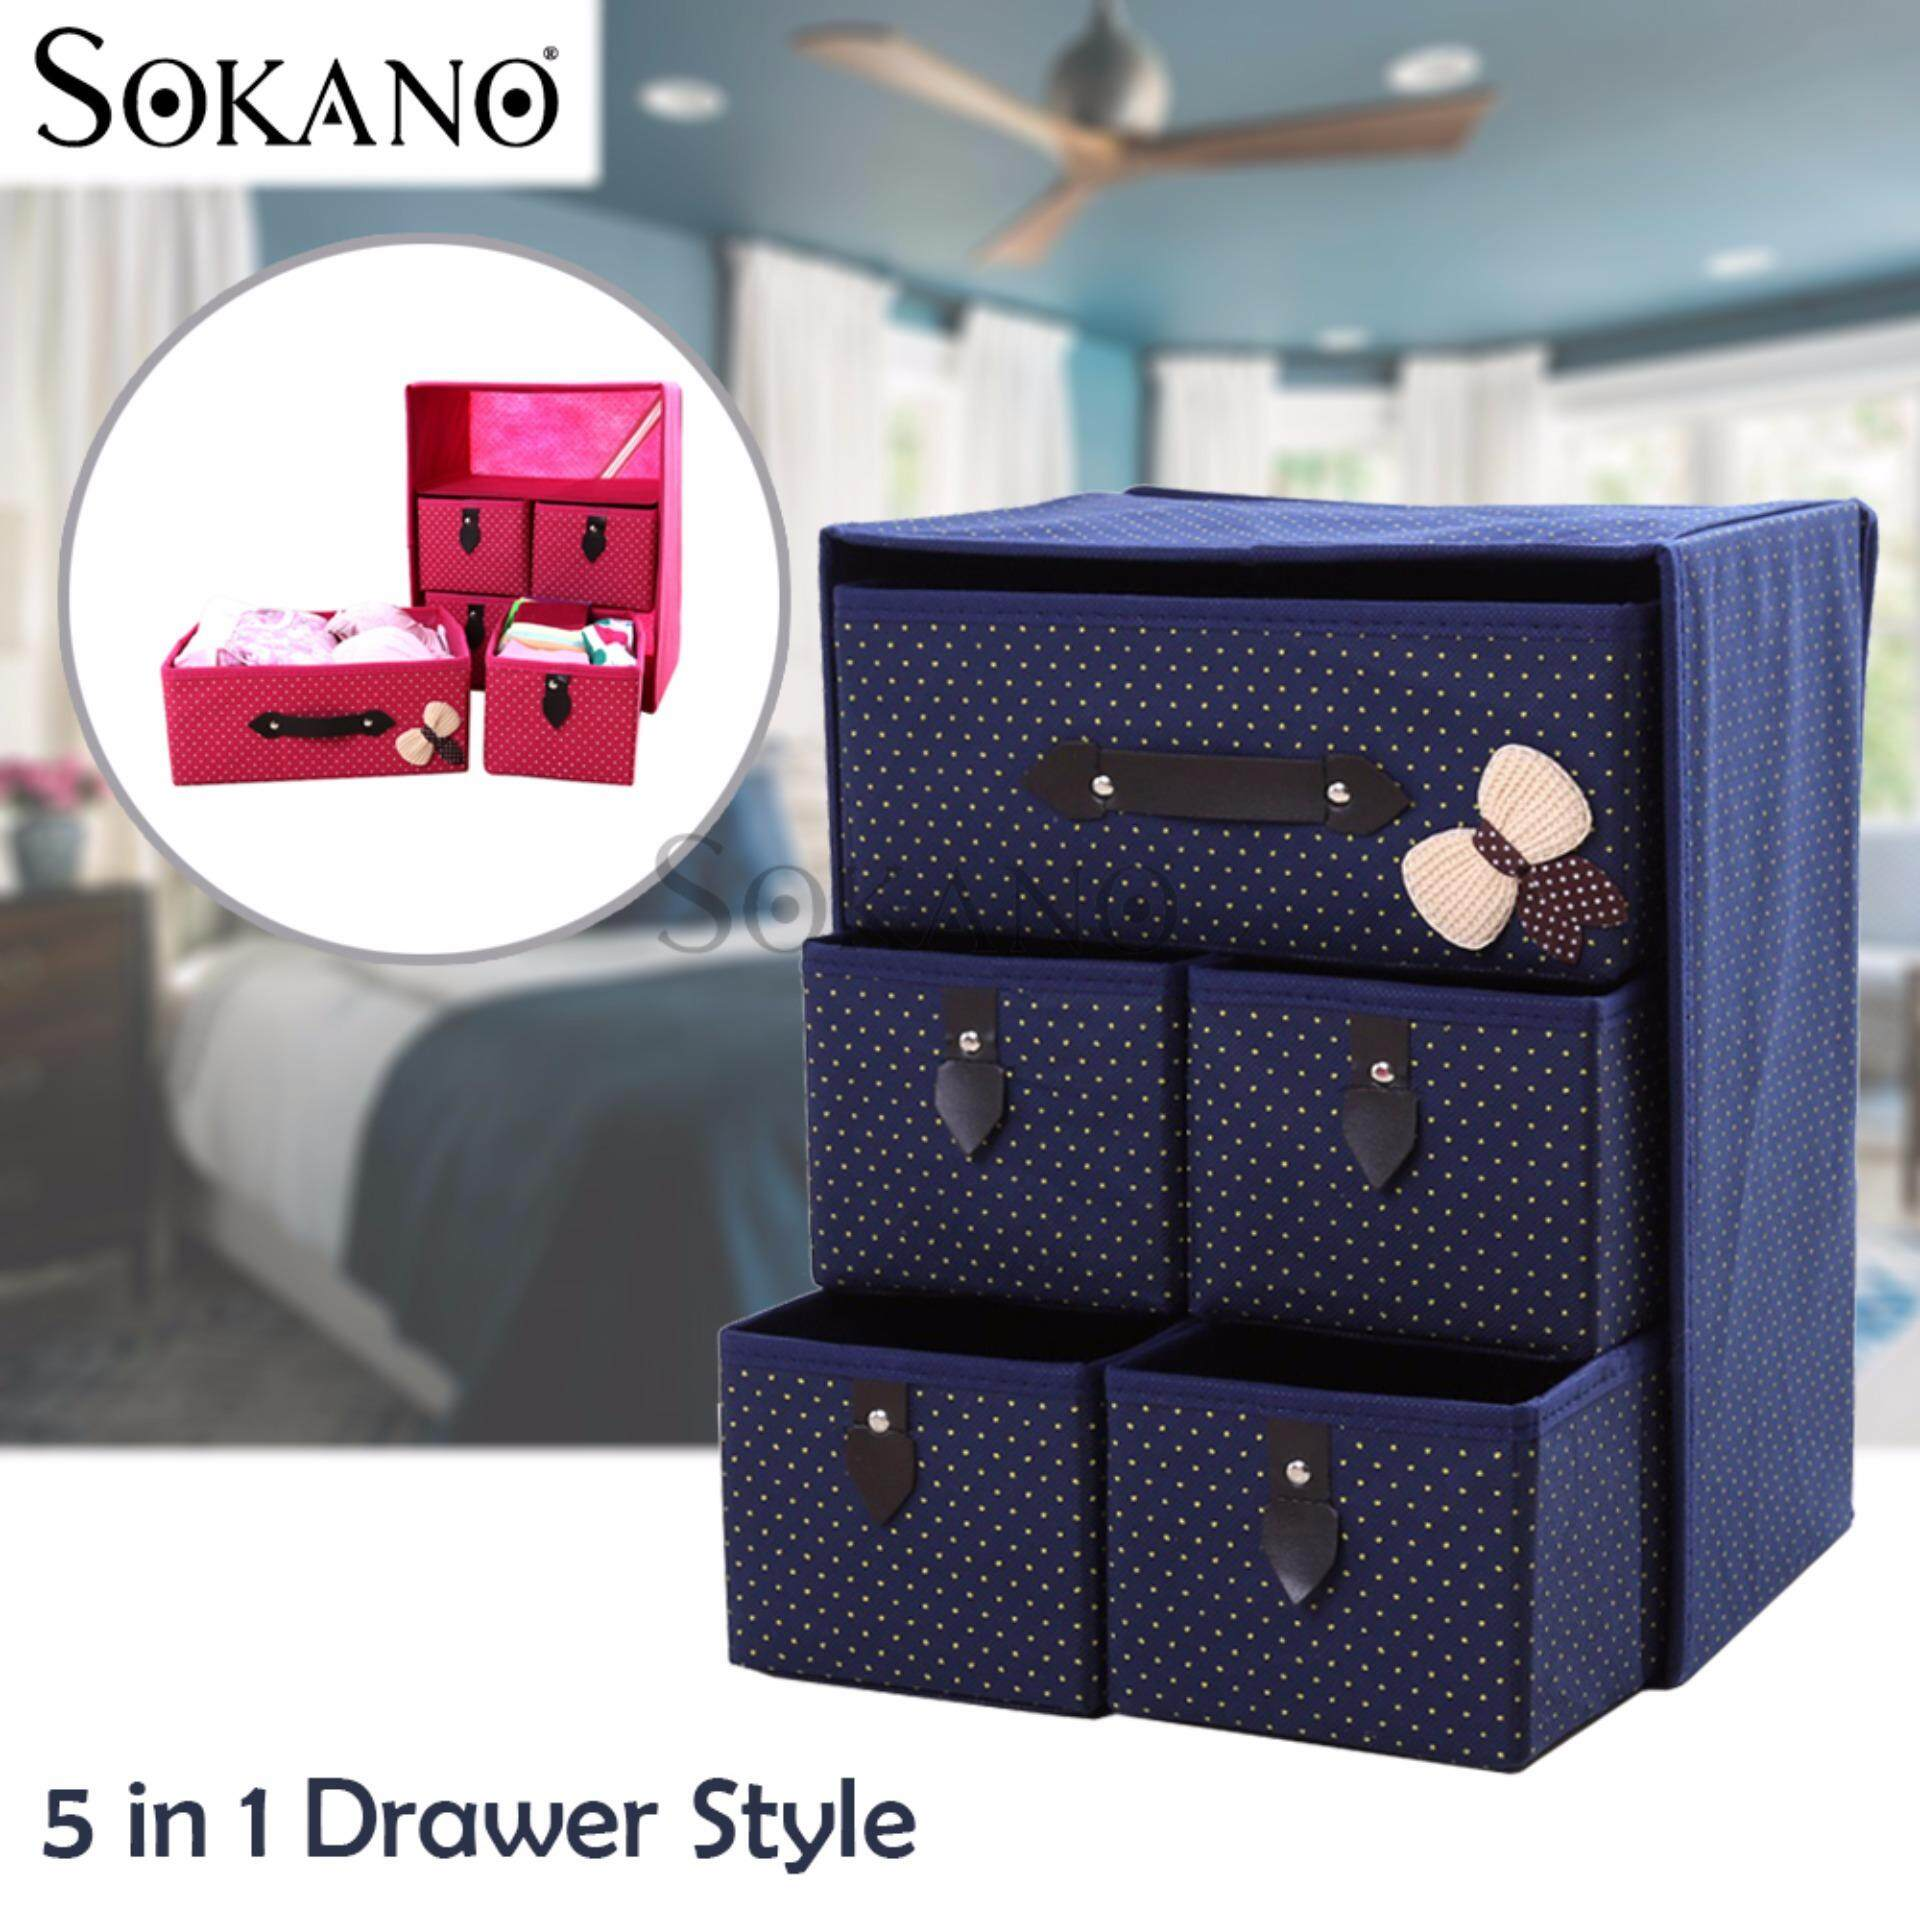 SOKANO SO001 Large Capacity 5 in 1 Drawer Style DIY Organizer Set - Dark Blue